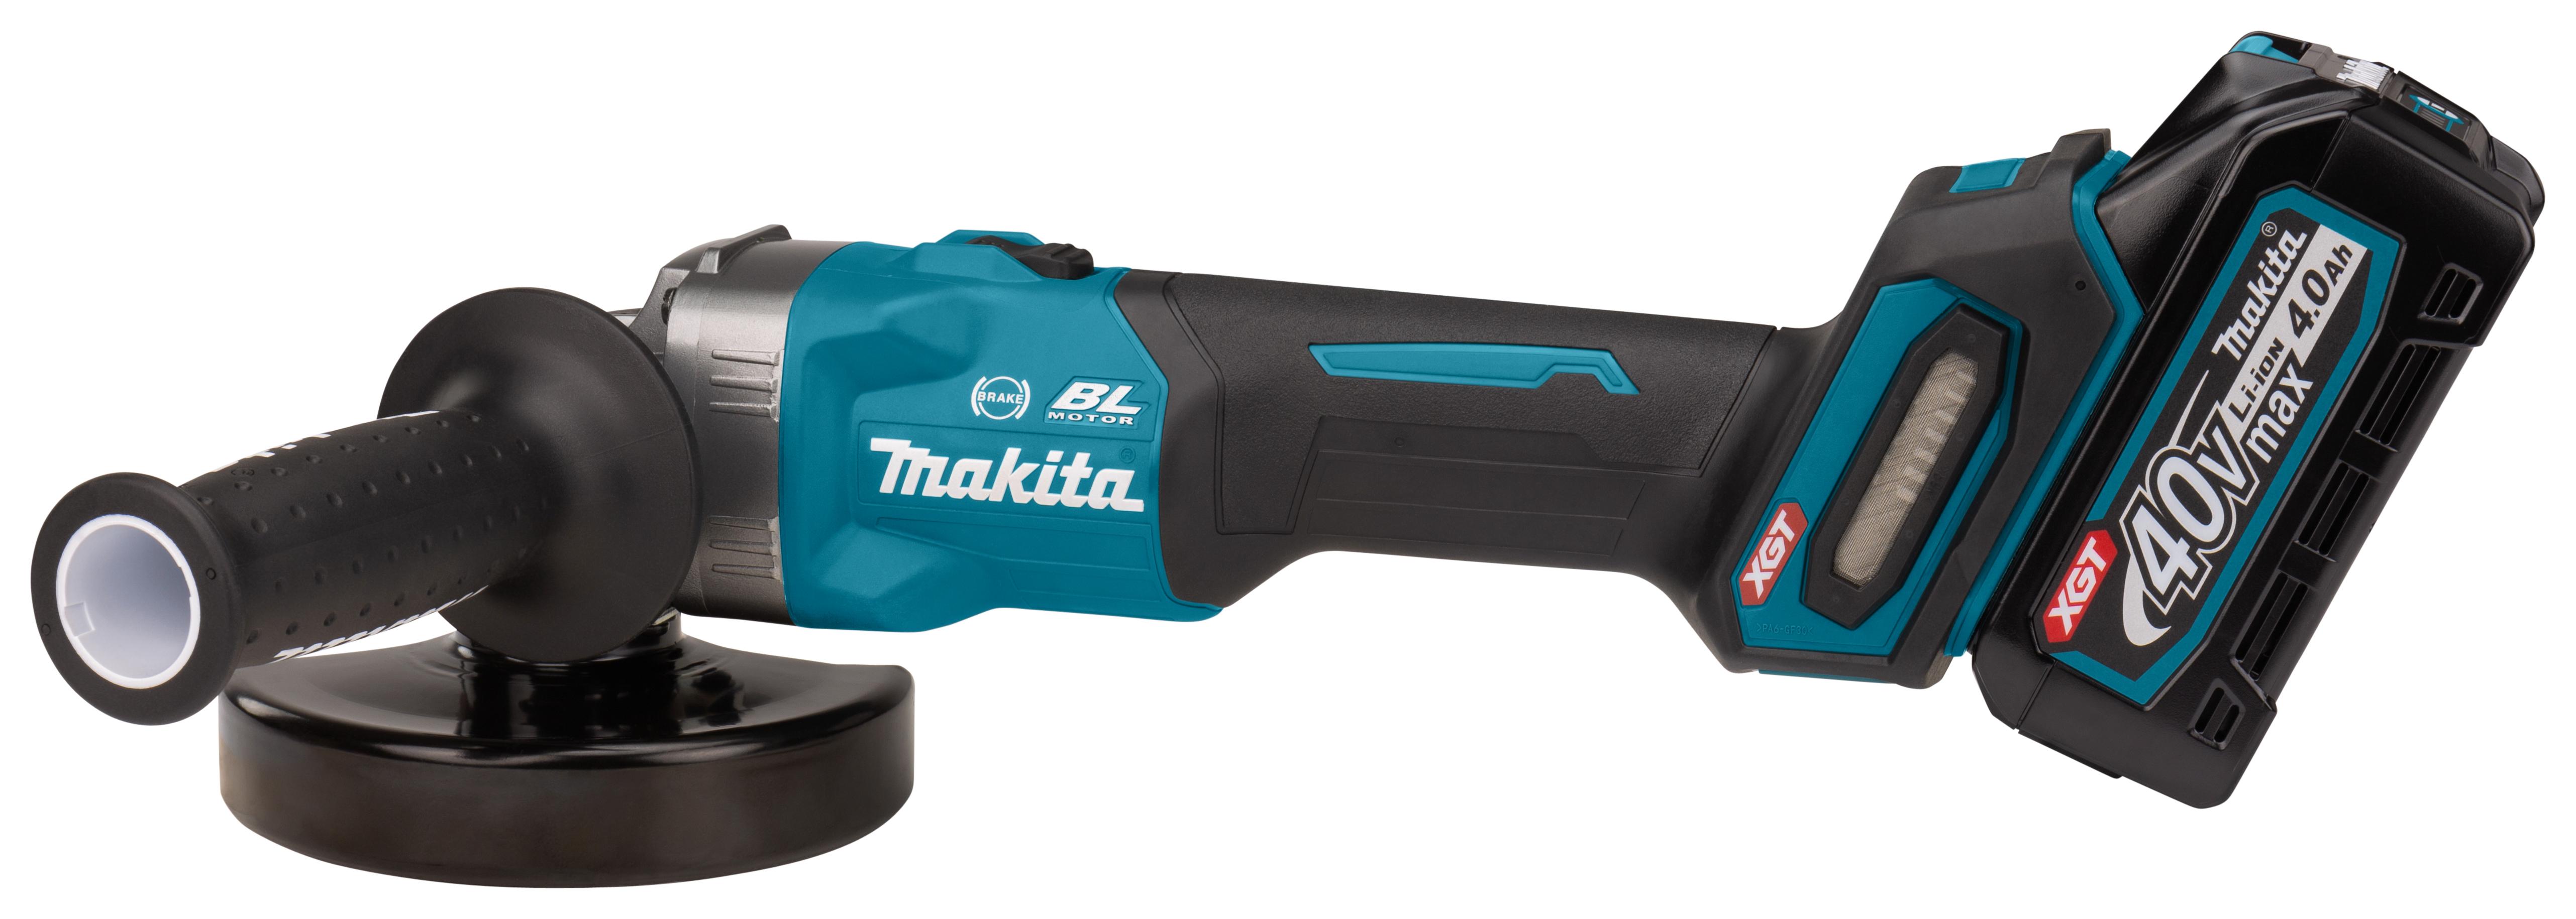 Makita GA005- 40V Max Haakse Slijper